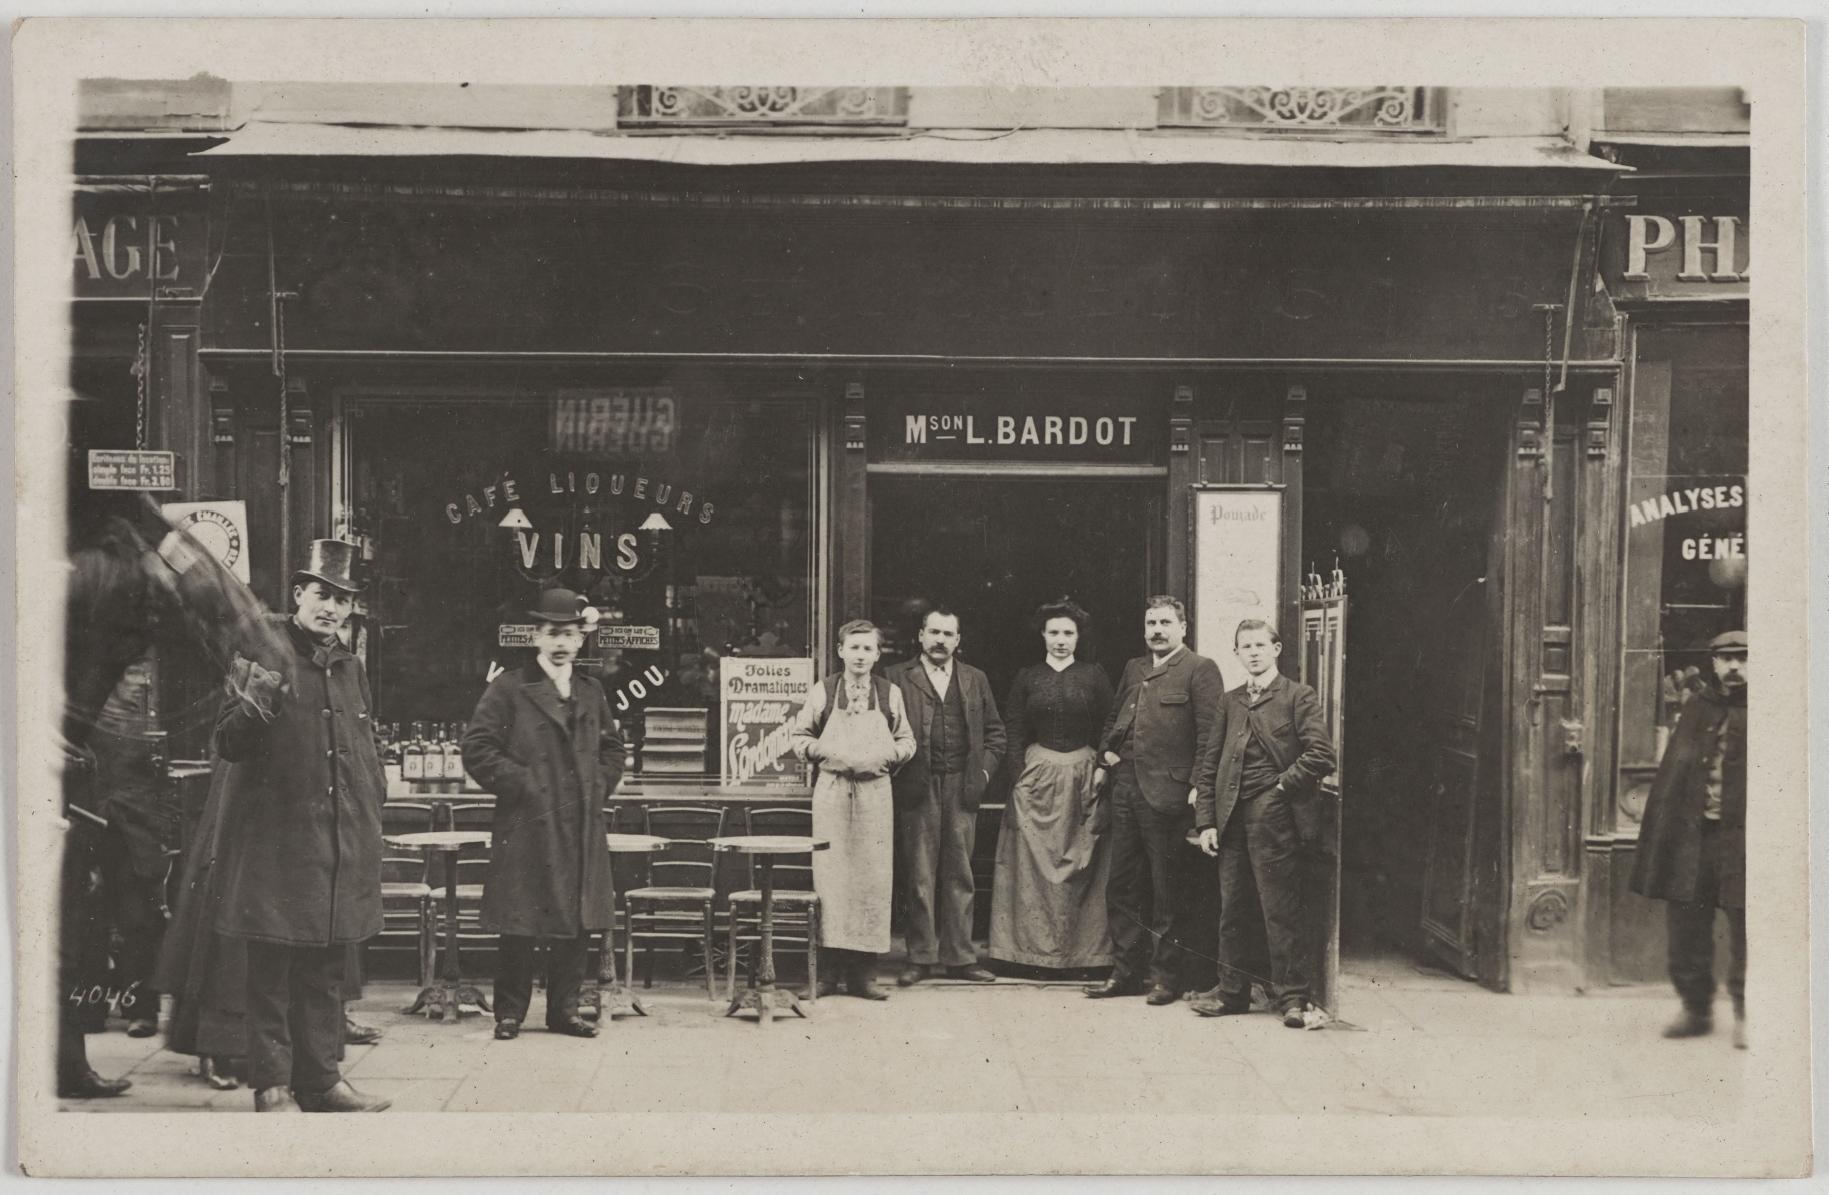 1905. Кафе, бильярд. Дом Л.Бардо, 15, rue du Faubourg St. Antoine (12-й округ).  Сейчас на этом месте ресторан Le Rempart